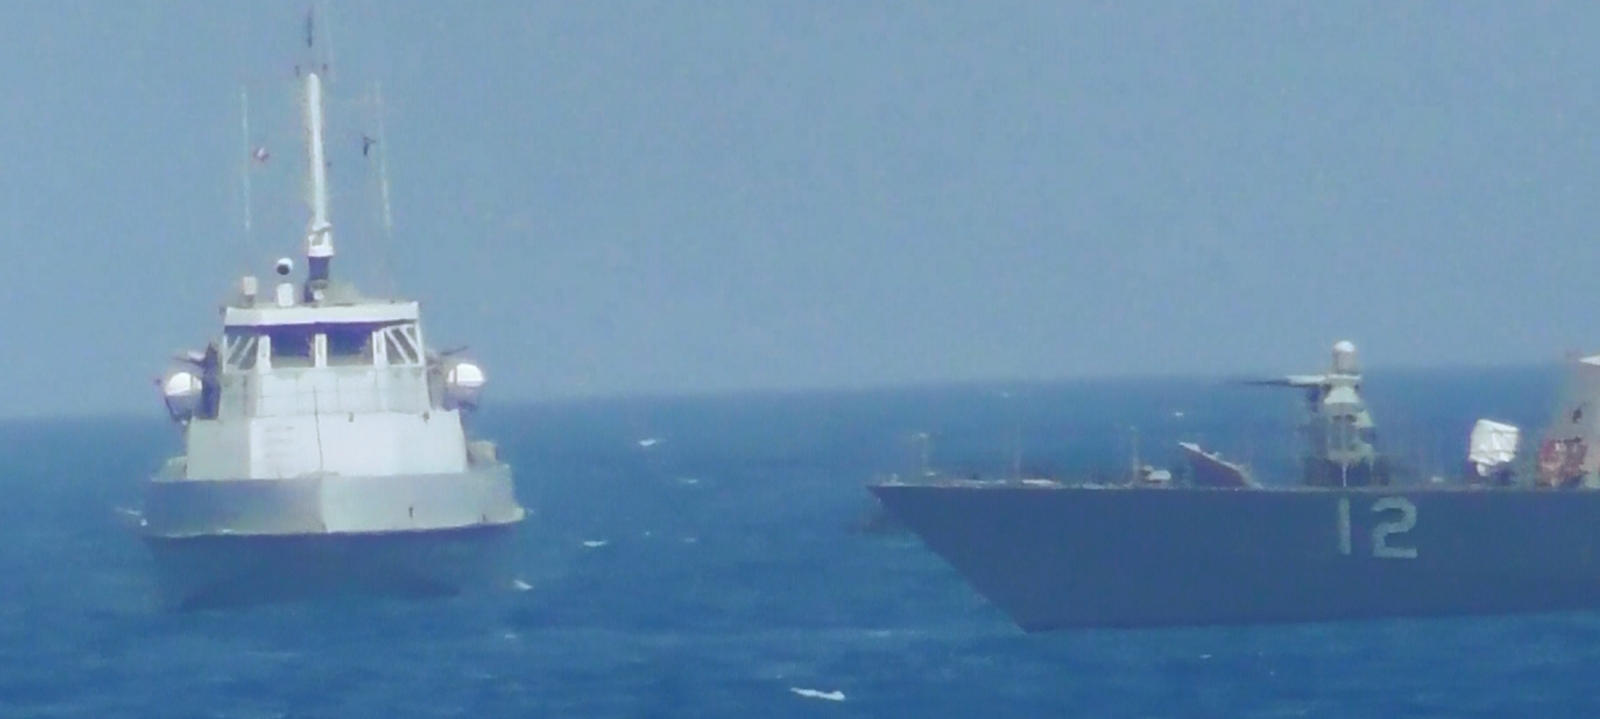 USS Thunderbolt in the Gulf